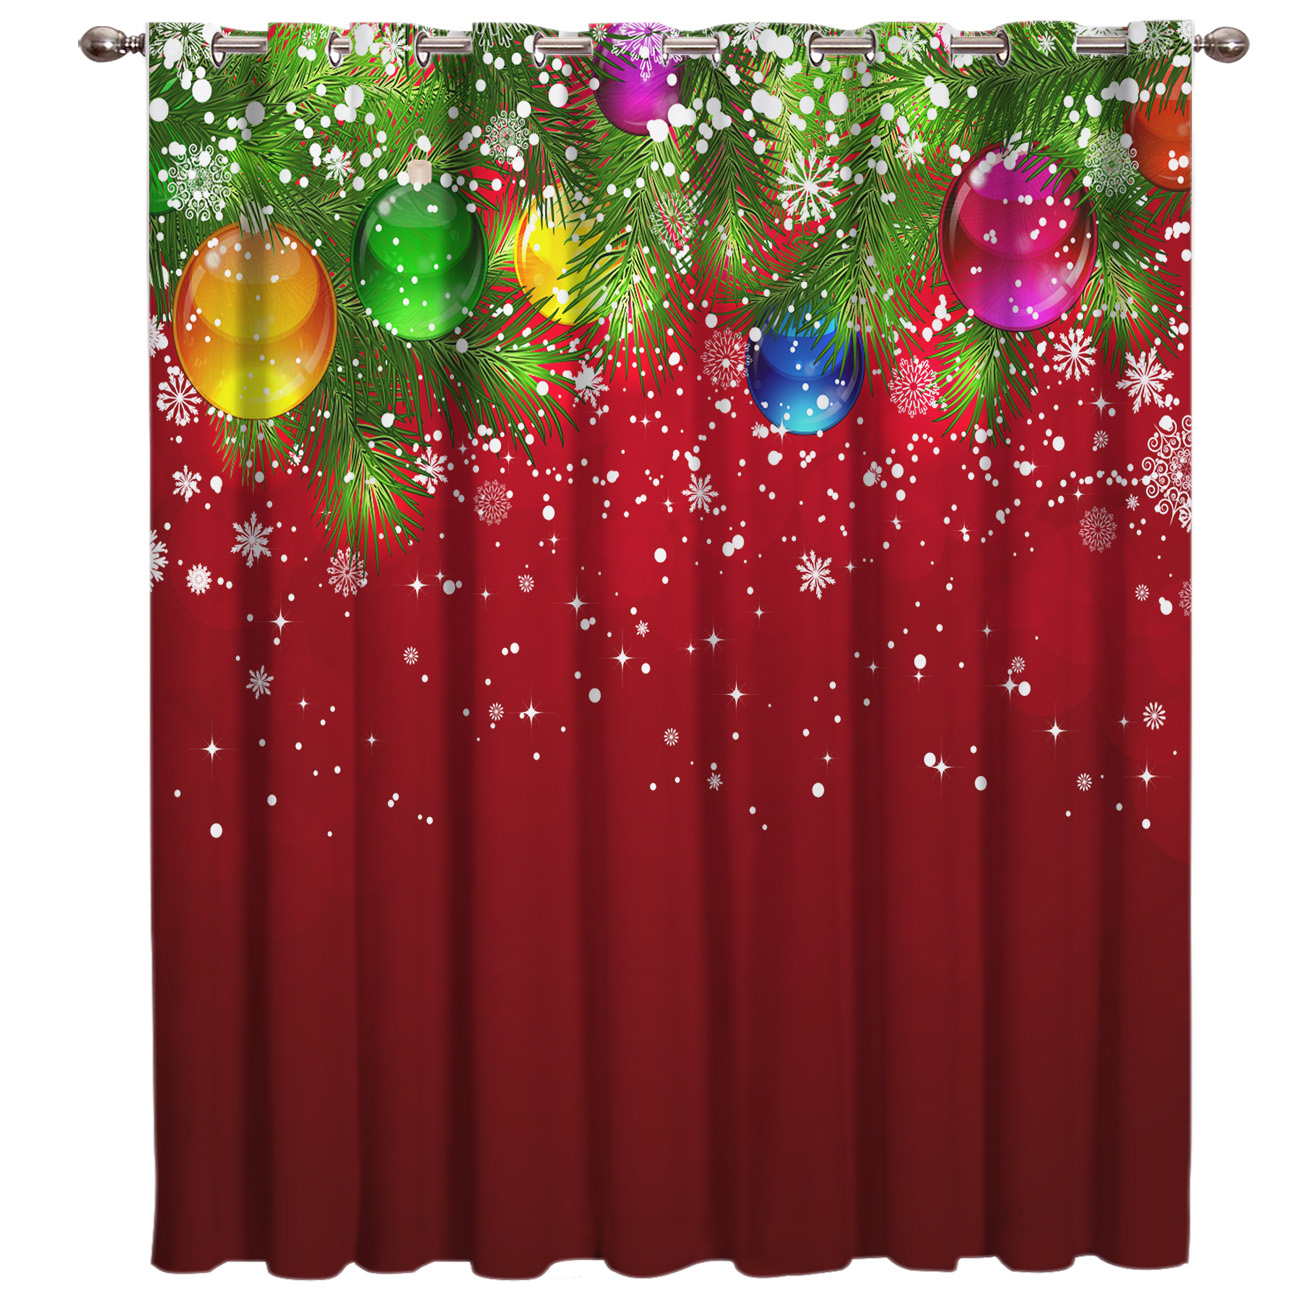 Merry Christams White Snow Window Curtains Dark Curtain Lights Living Room Blackout Bathroom Bedroom Fabric Decor Kids Curtain